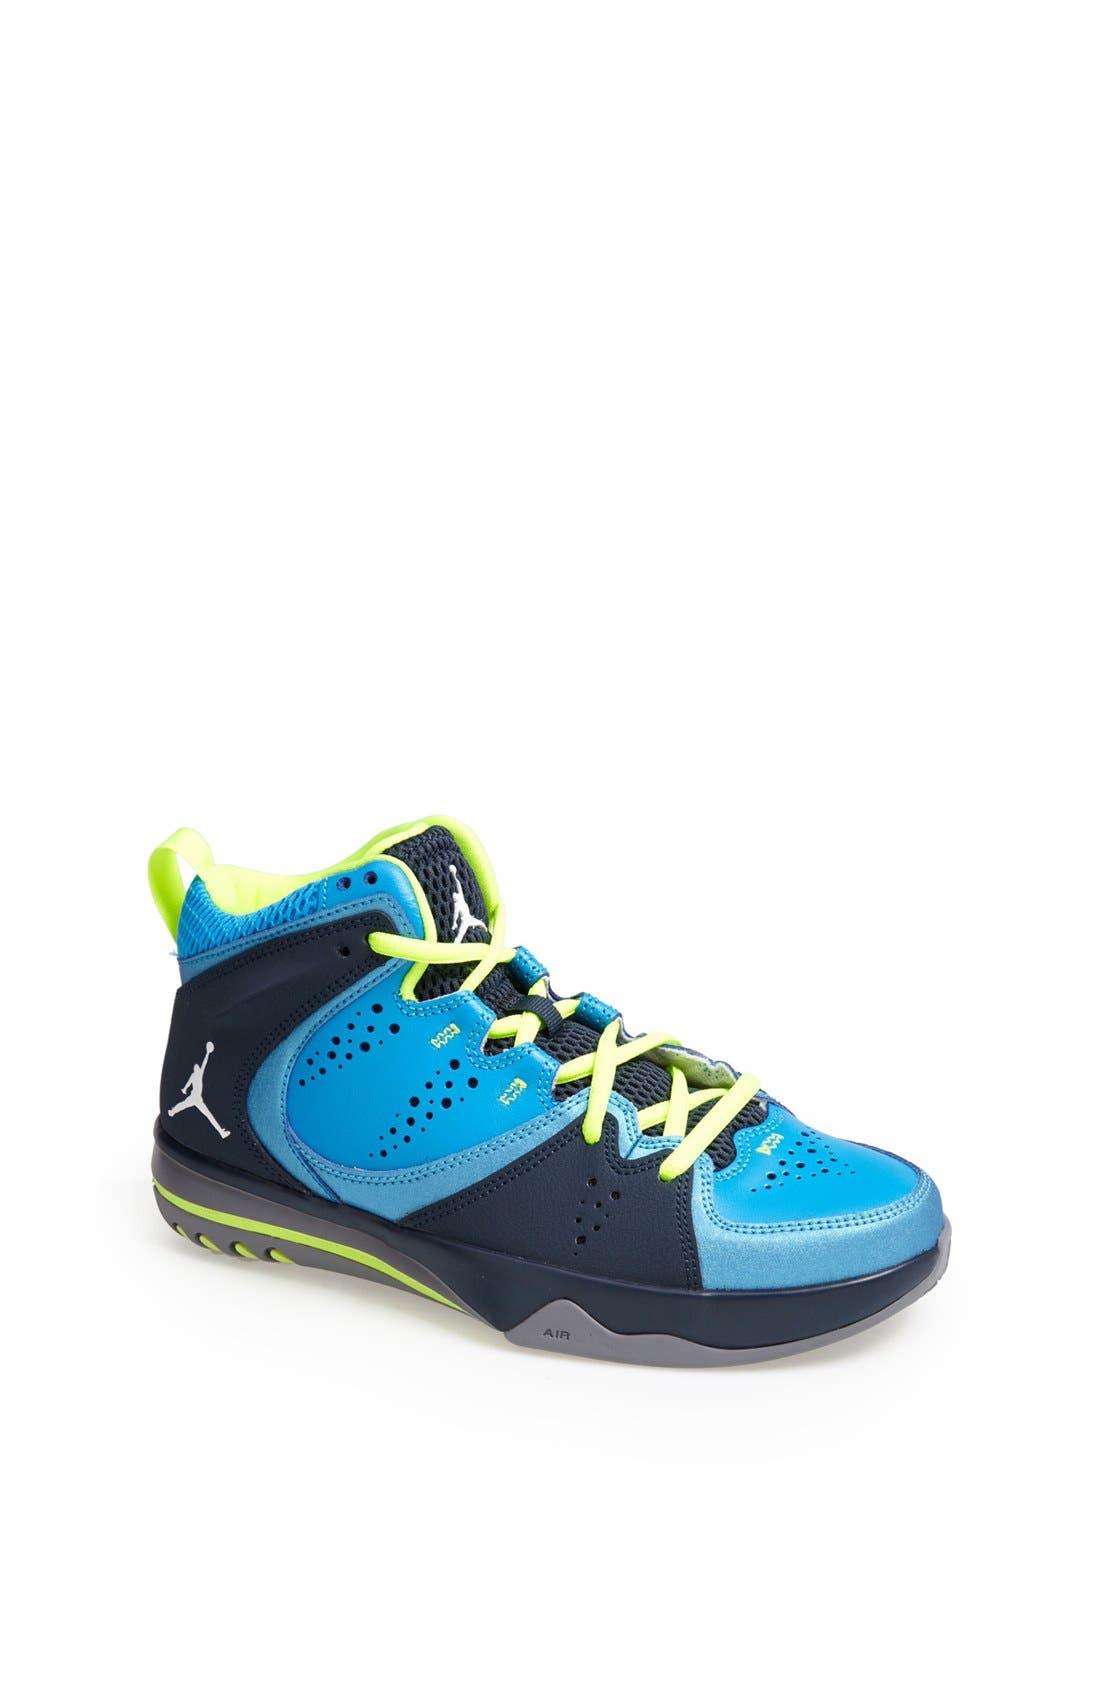 Alternate Image 1 Selected - Nike 'Jordan Phase 23 2' Sneaker (Big Kid)